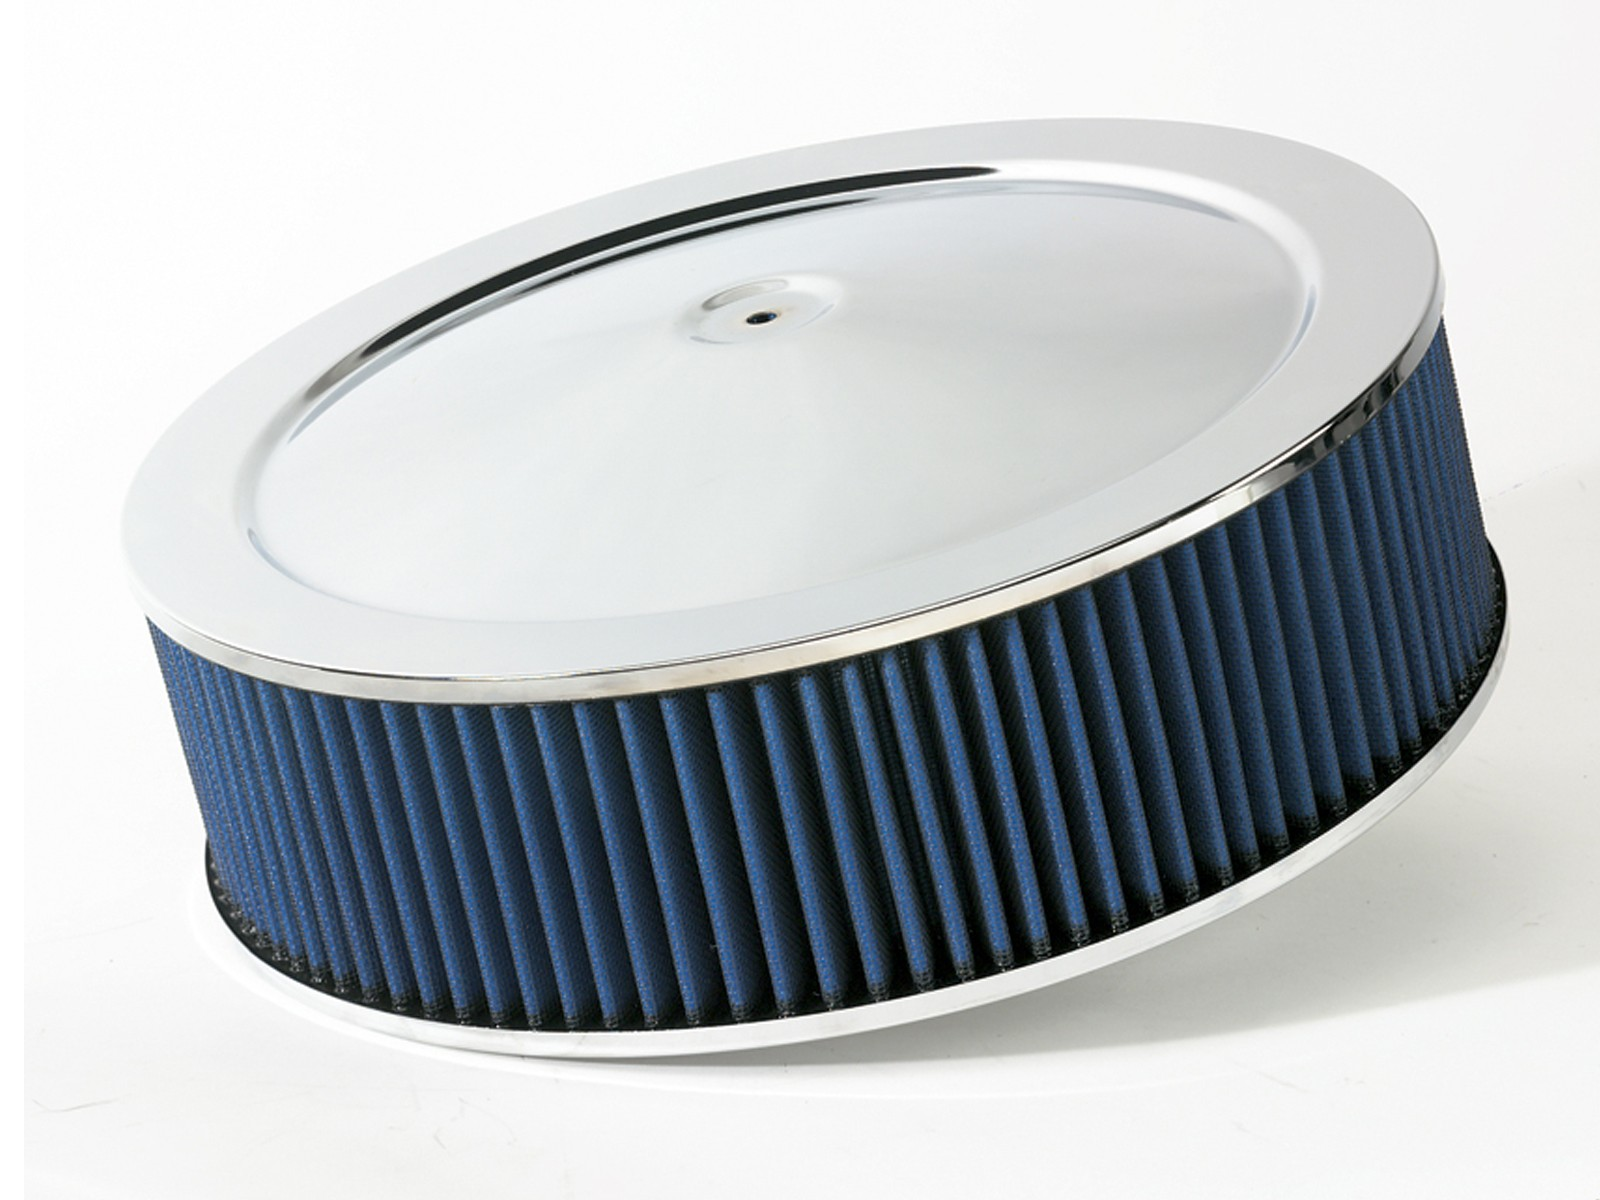 aFe POWER 18-21402 Magnum FLOW Pro 5R Air Filter